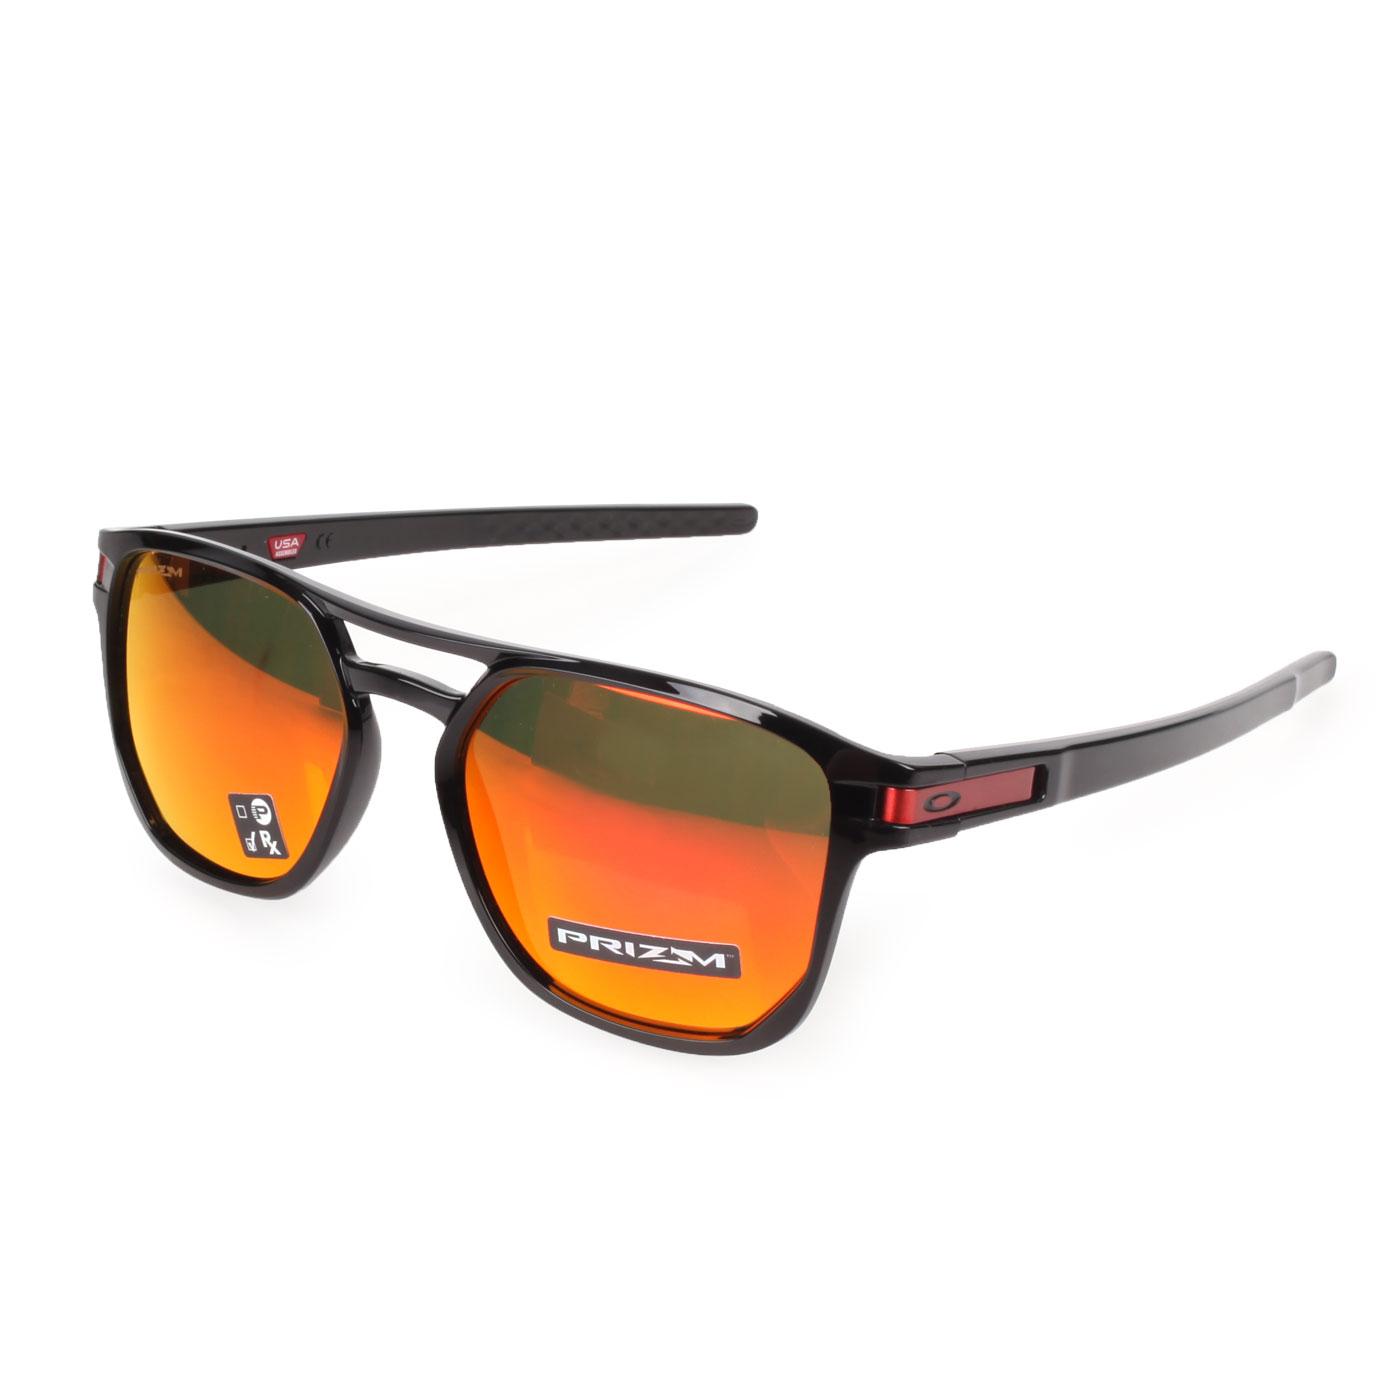 OAKLEY LATCH BETA 一般太陽眼鏡(附鏡袋無鼻墊) OAK-OO9436-0754 - 黑紅